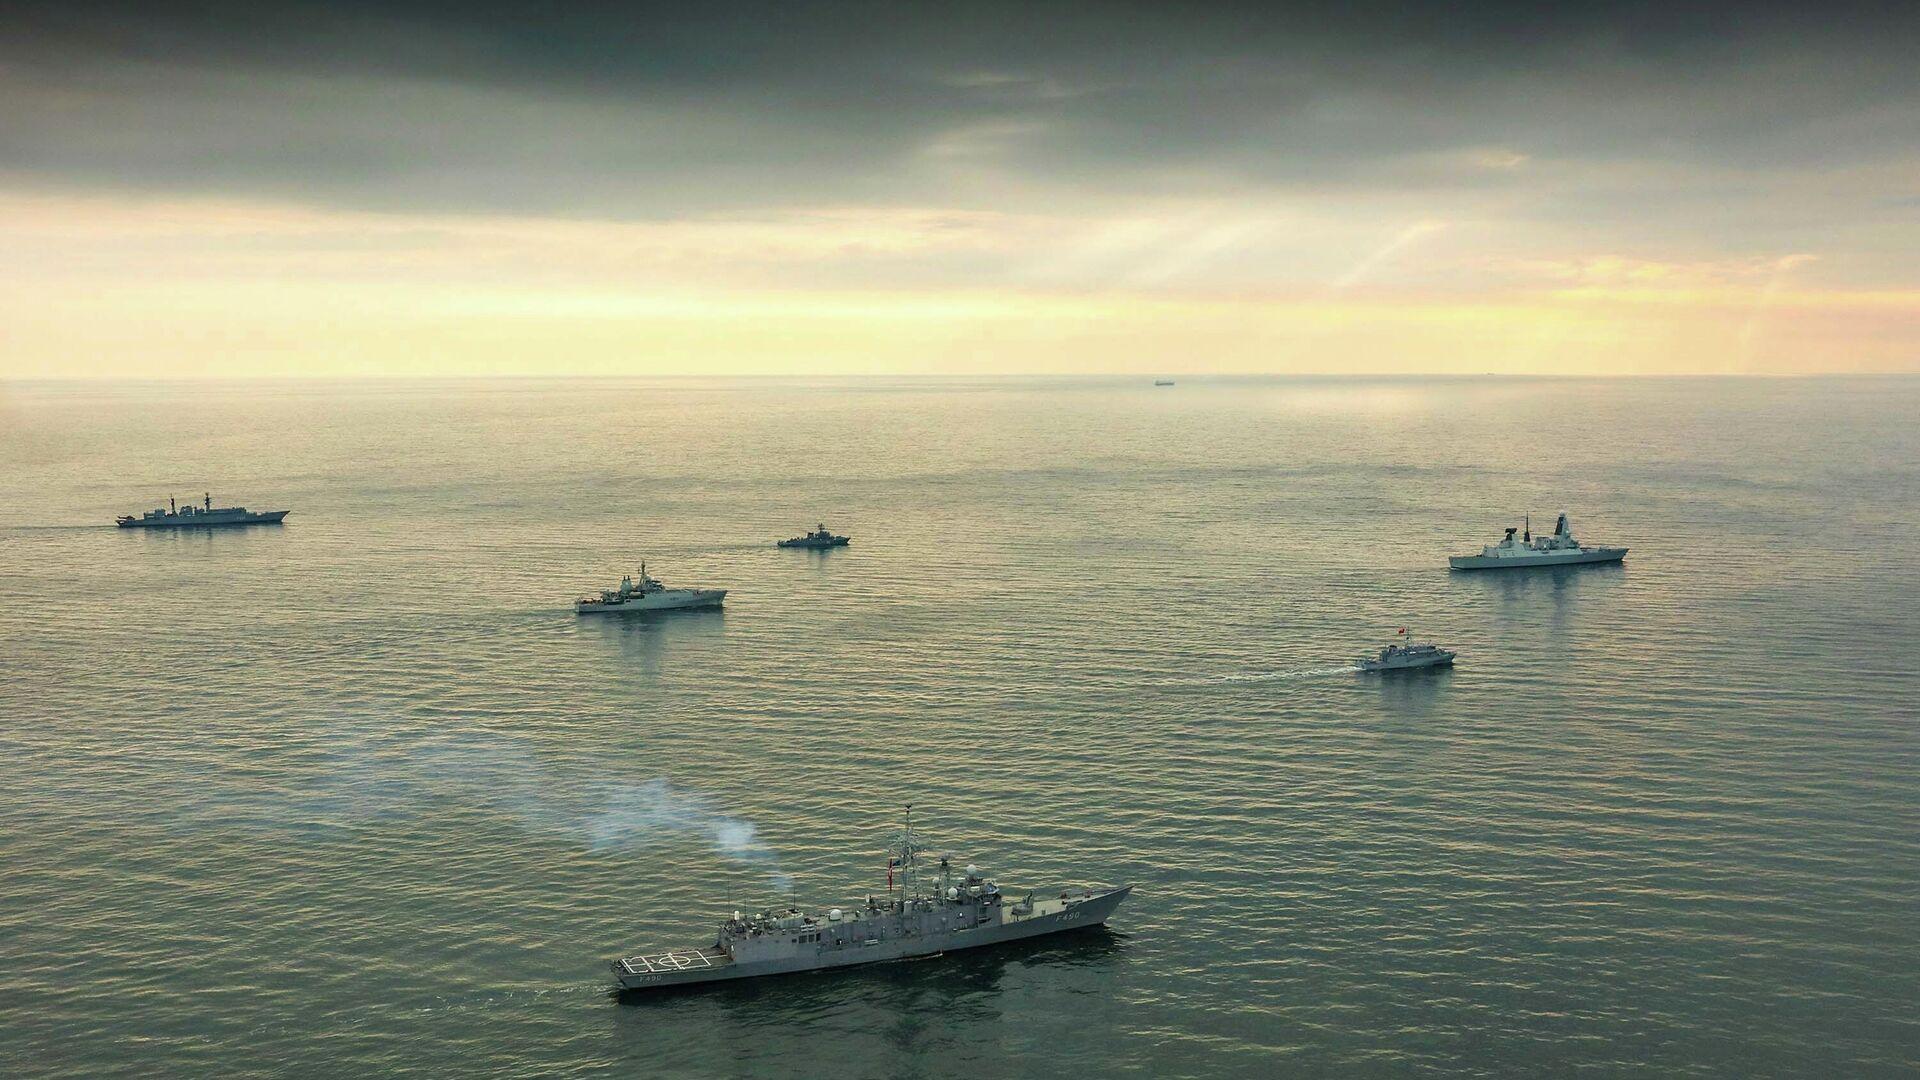 Корабли НАТО в Черном море - РИА Новости, 1920, 19.08.2020